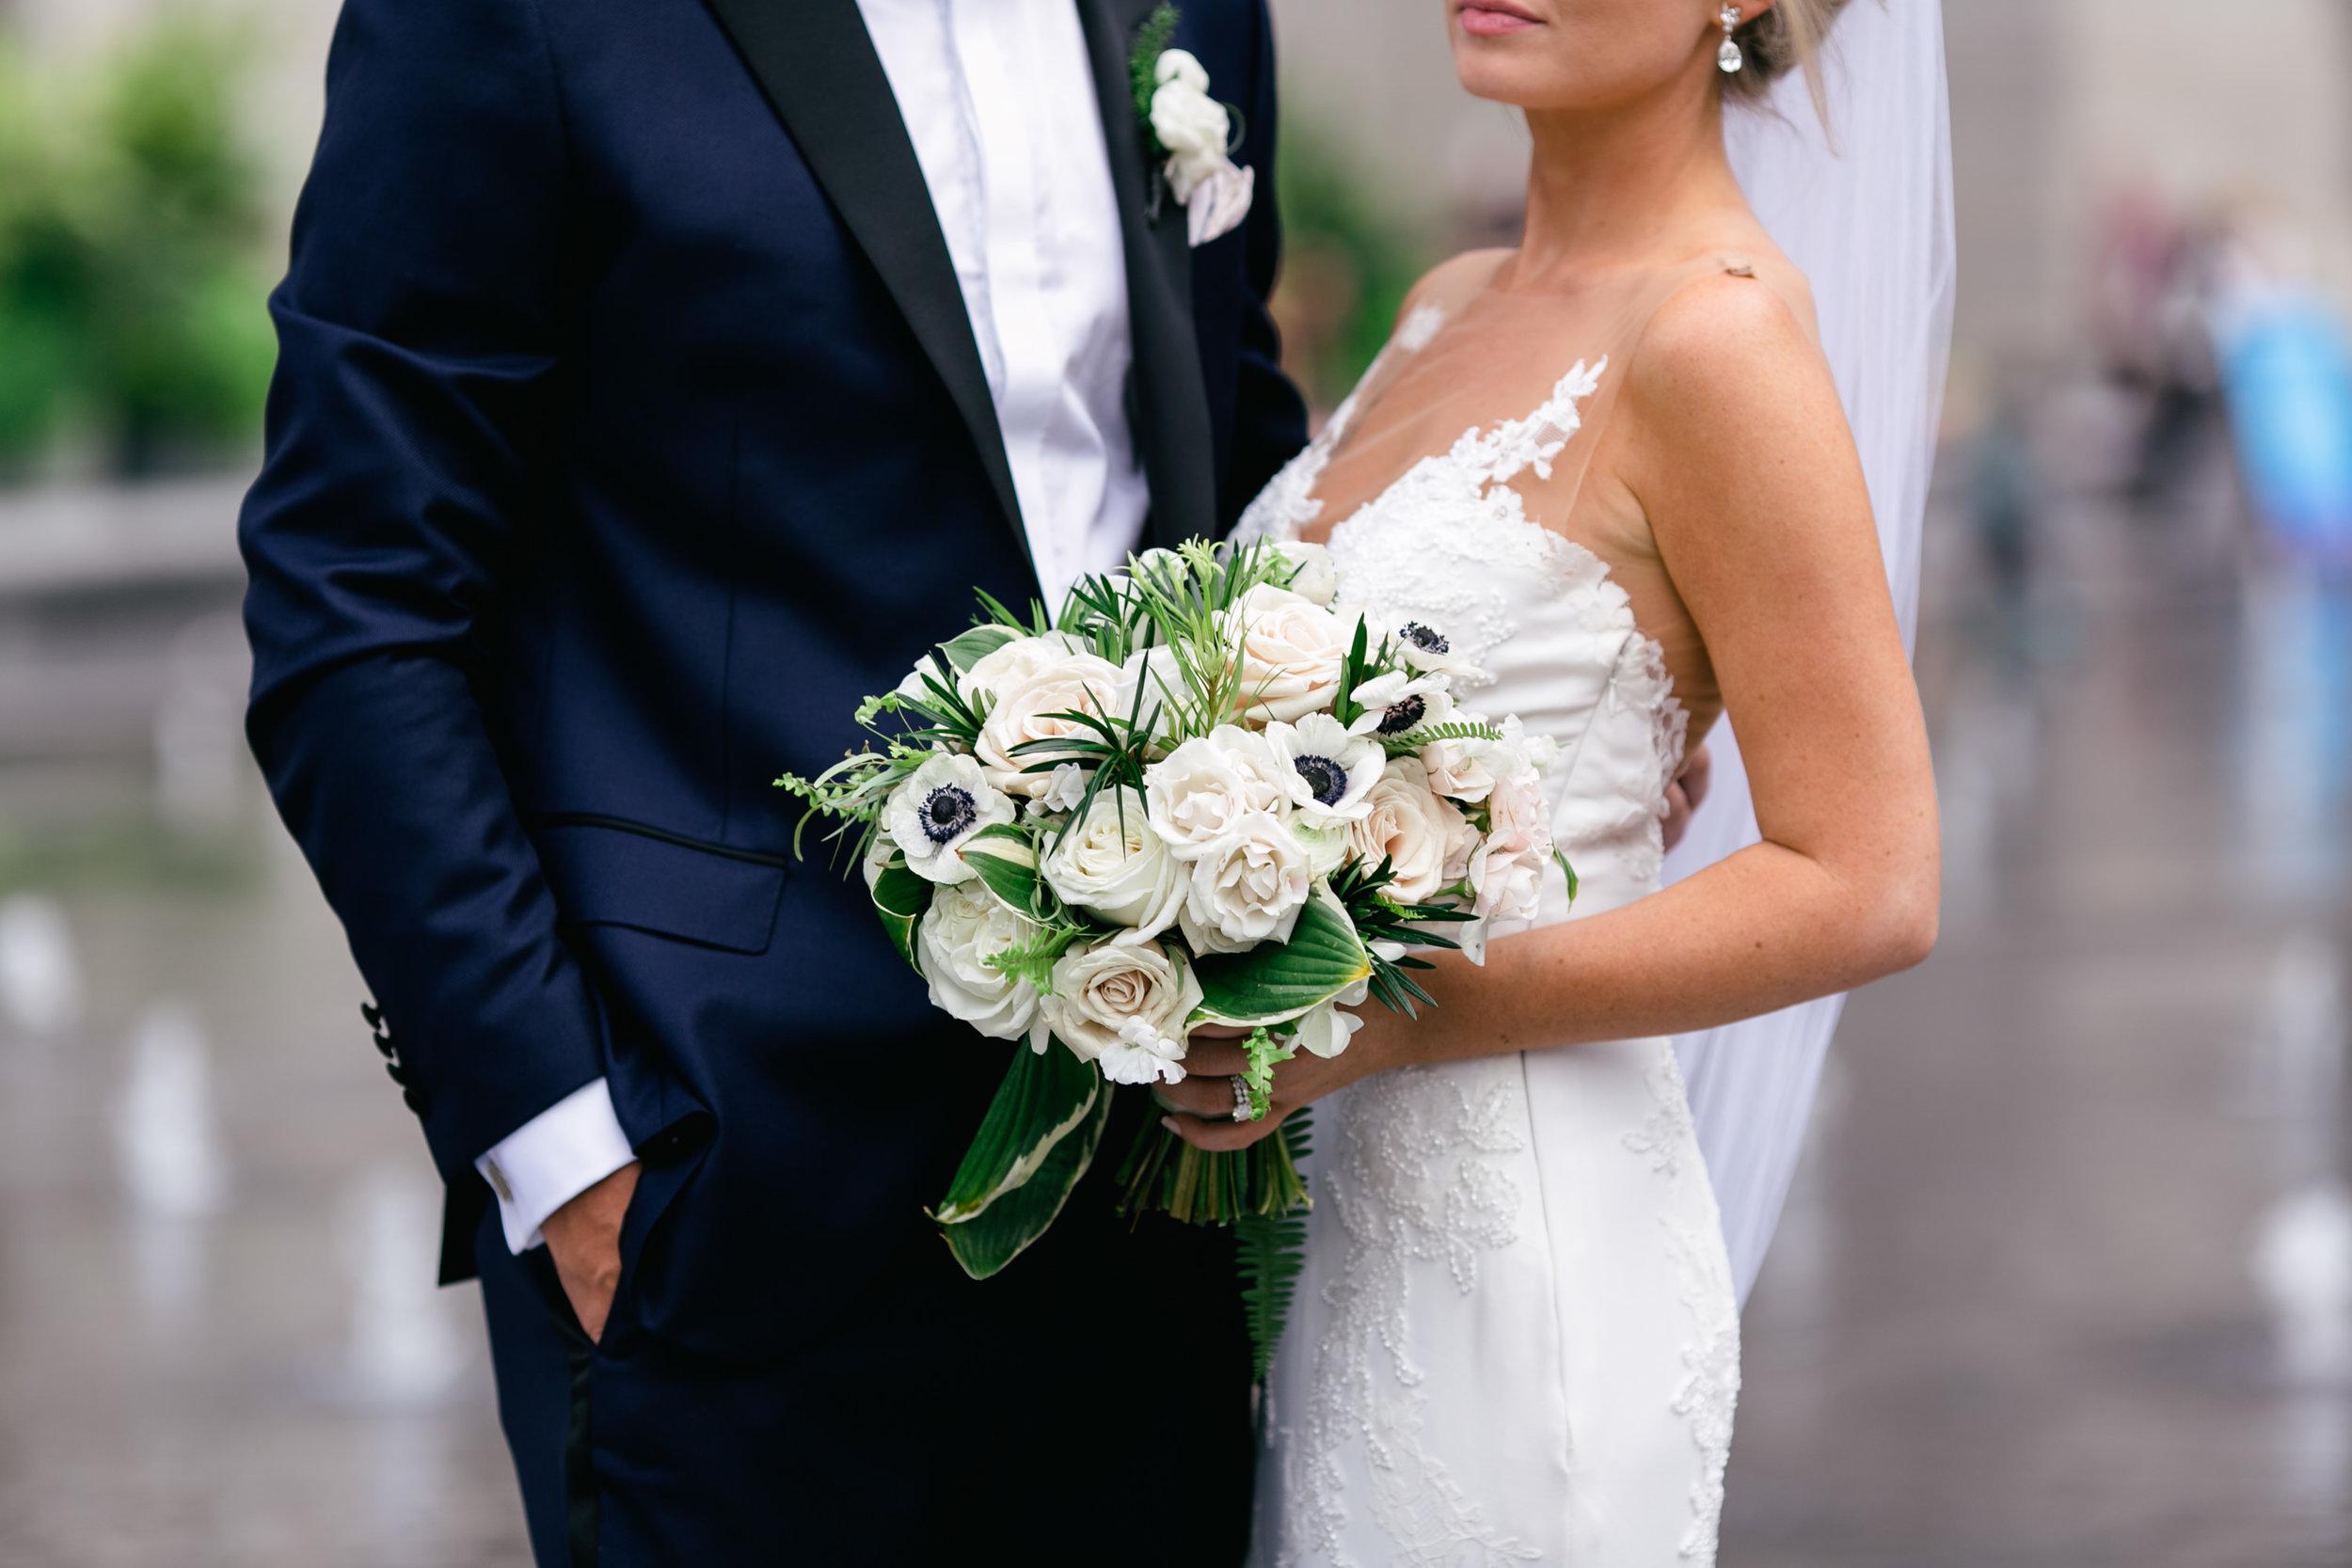 photography-wedding-weddings-natural-candid-union league-philadelphia-black tie-city hall-broad street-editorial-modern-fine-art-24.JPG